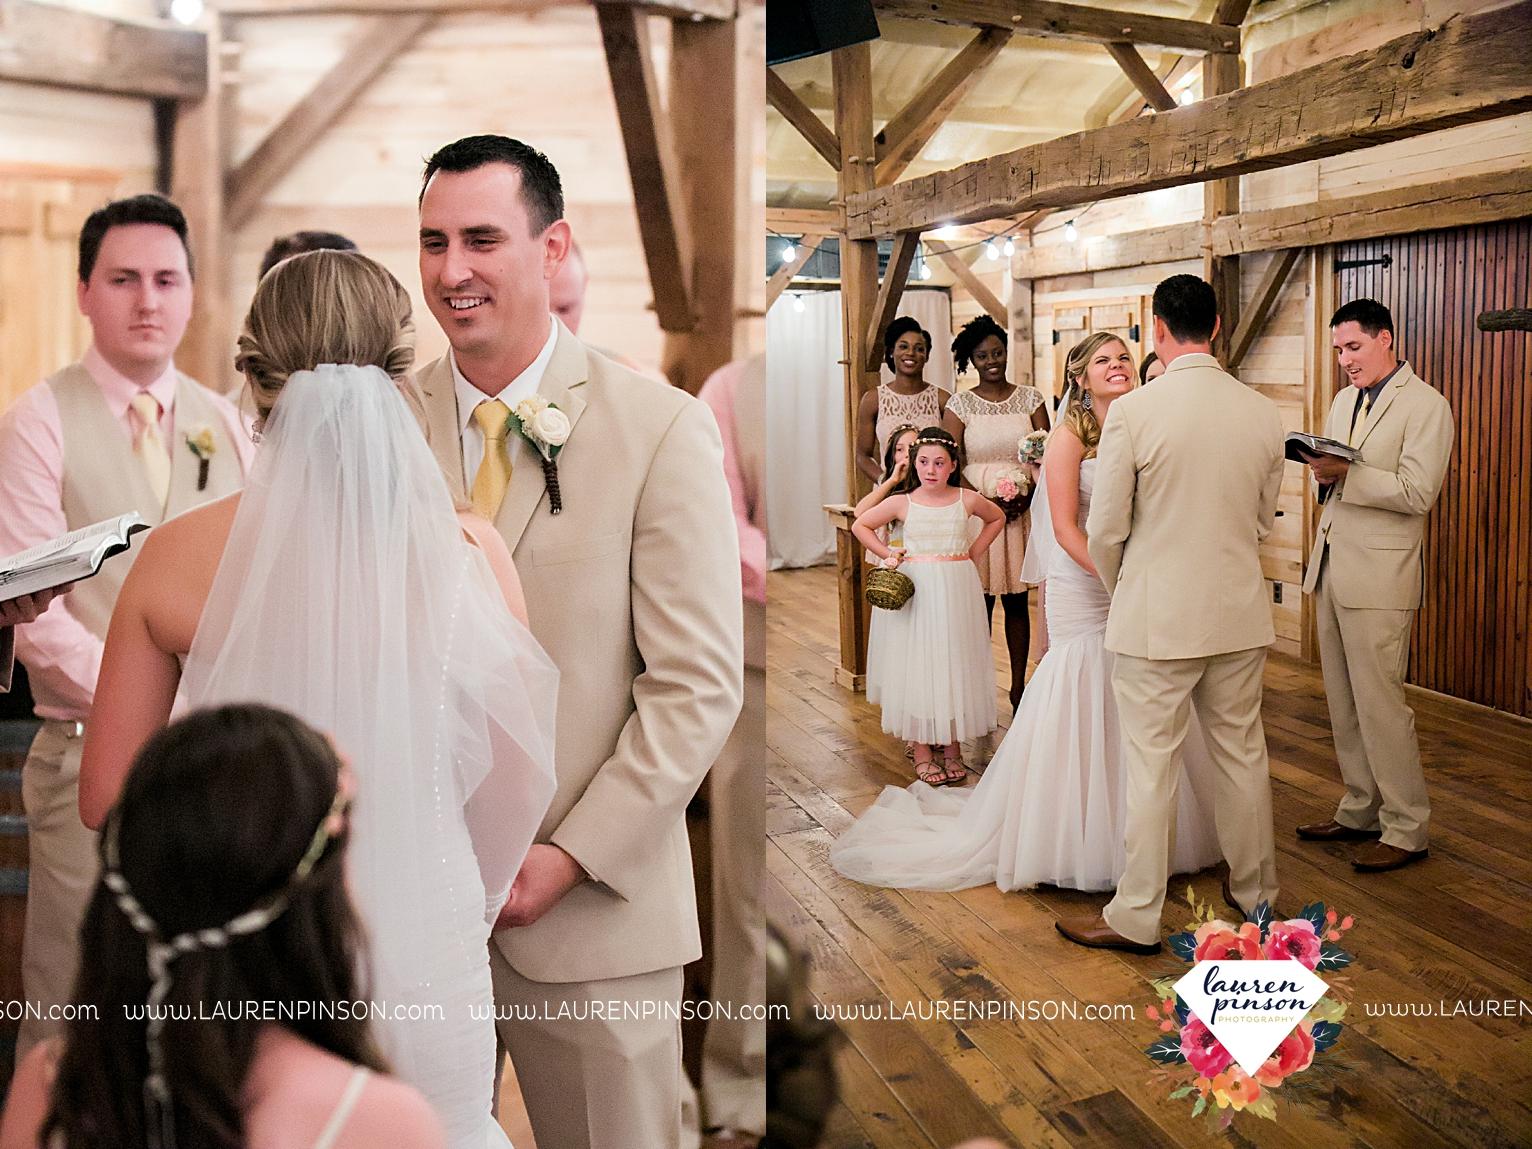 weatherford-texas-hollow-hill-farm-event-wedding-mineral-wells-dfw-wedding-photographer-wichita-falls-photography_3163.jpg